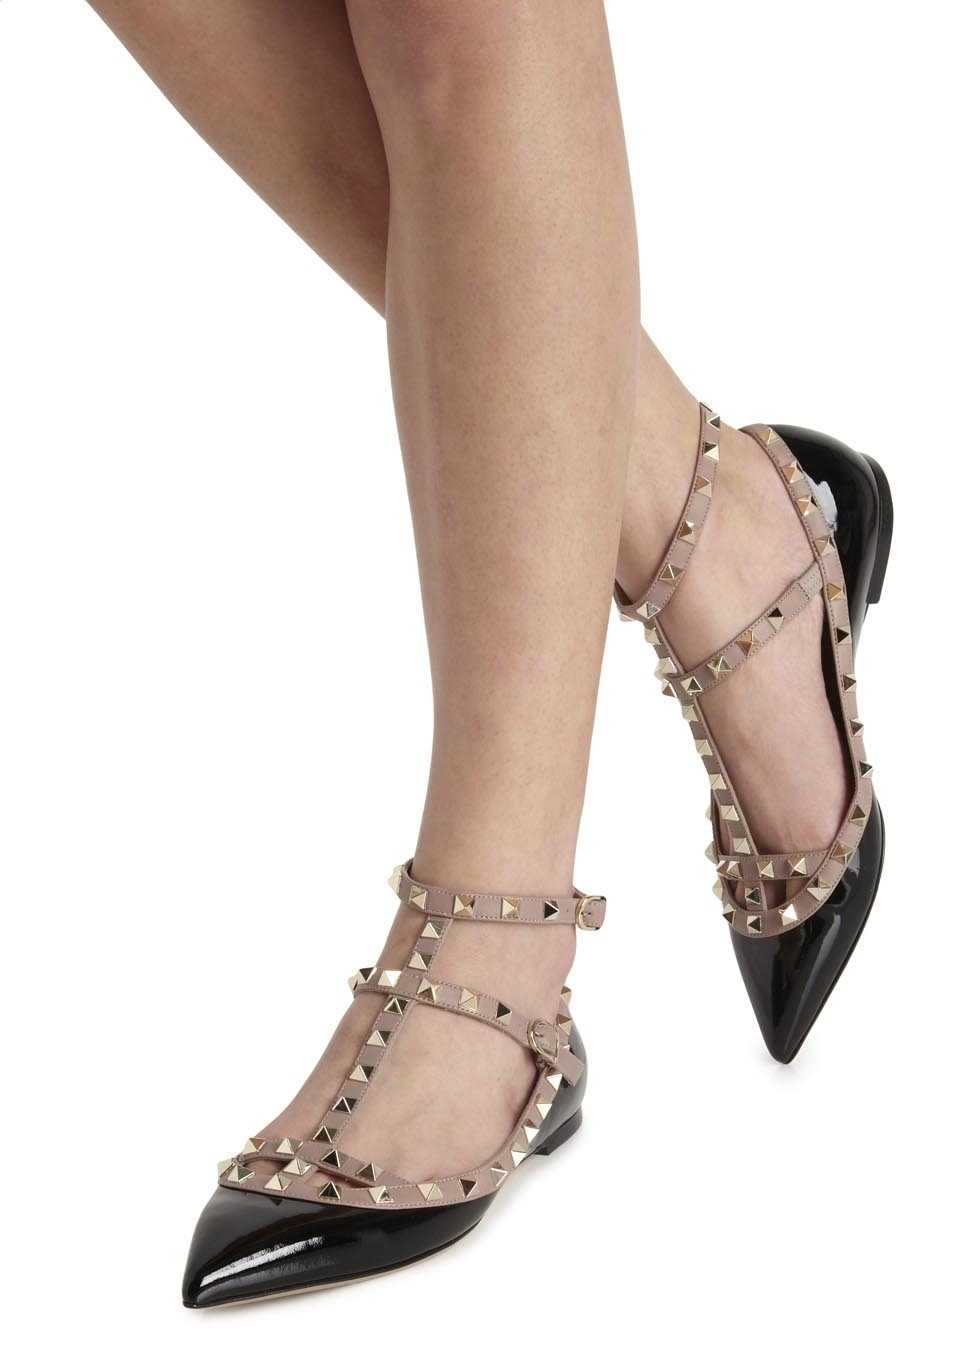 fd4bfea0b3e5a Valentino Rockstud Leather Flats in Black - Lyst